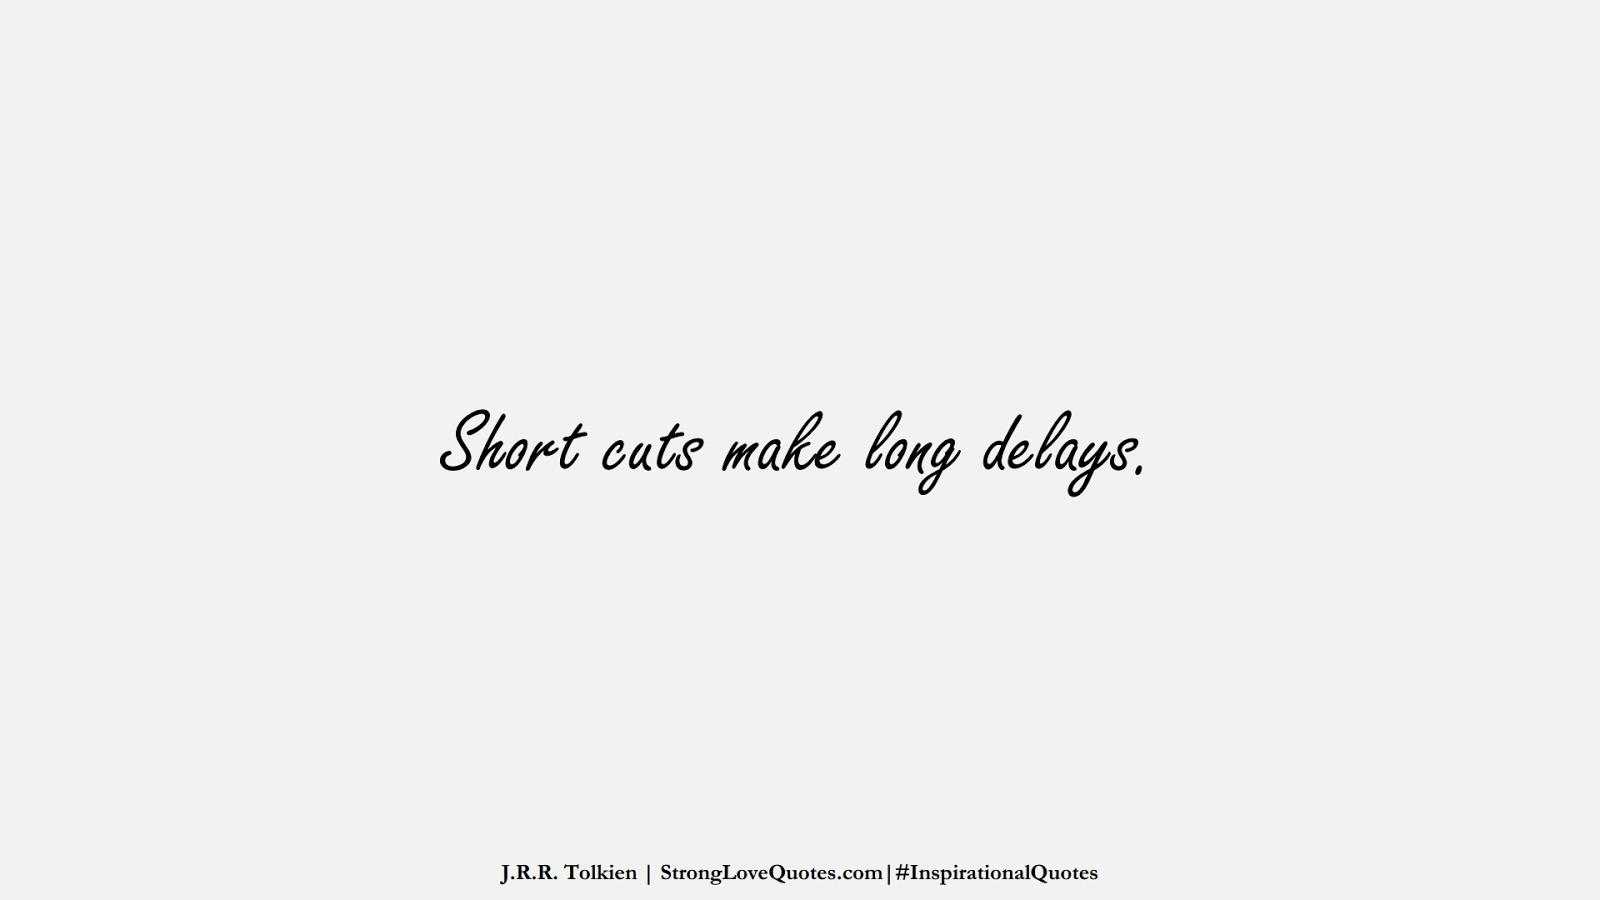 Short cuts make long delays. (J.R.R. Tolkien);  #InspirationalQuotes